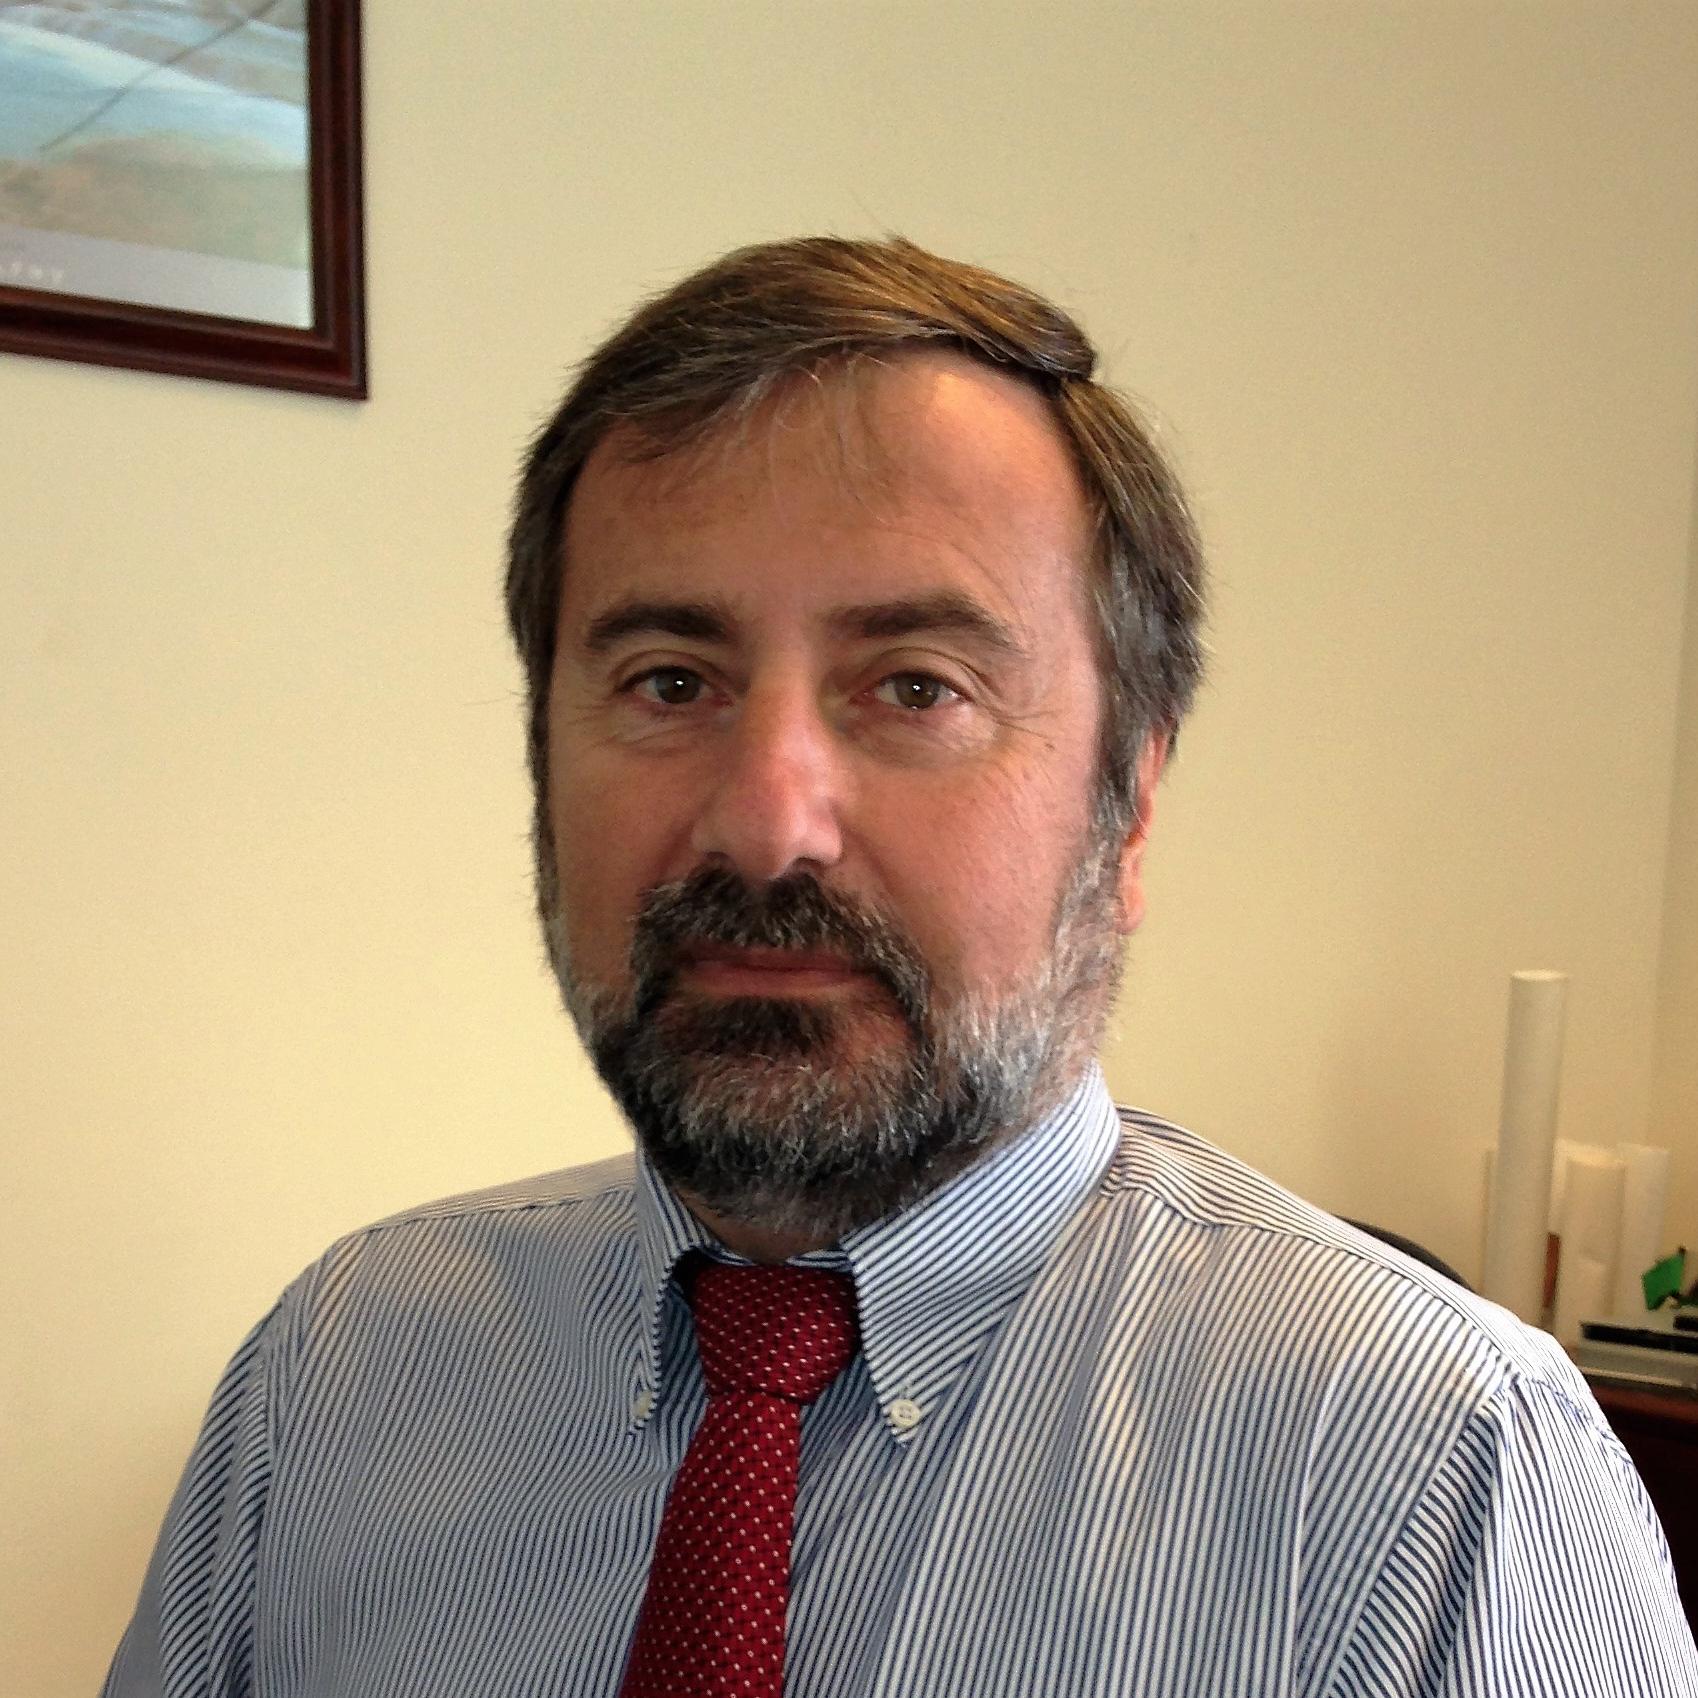 Paul Scheib